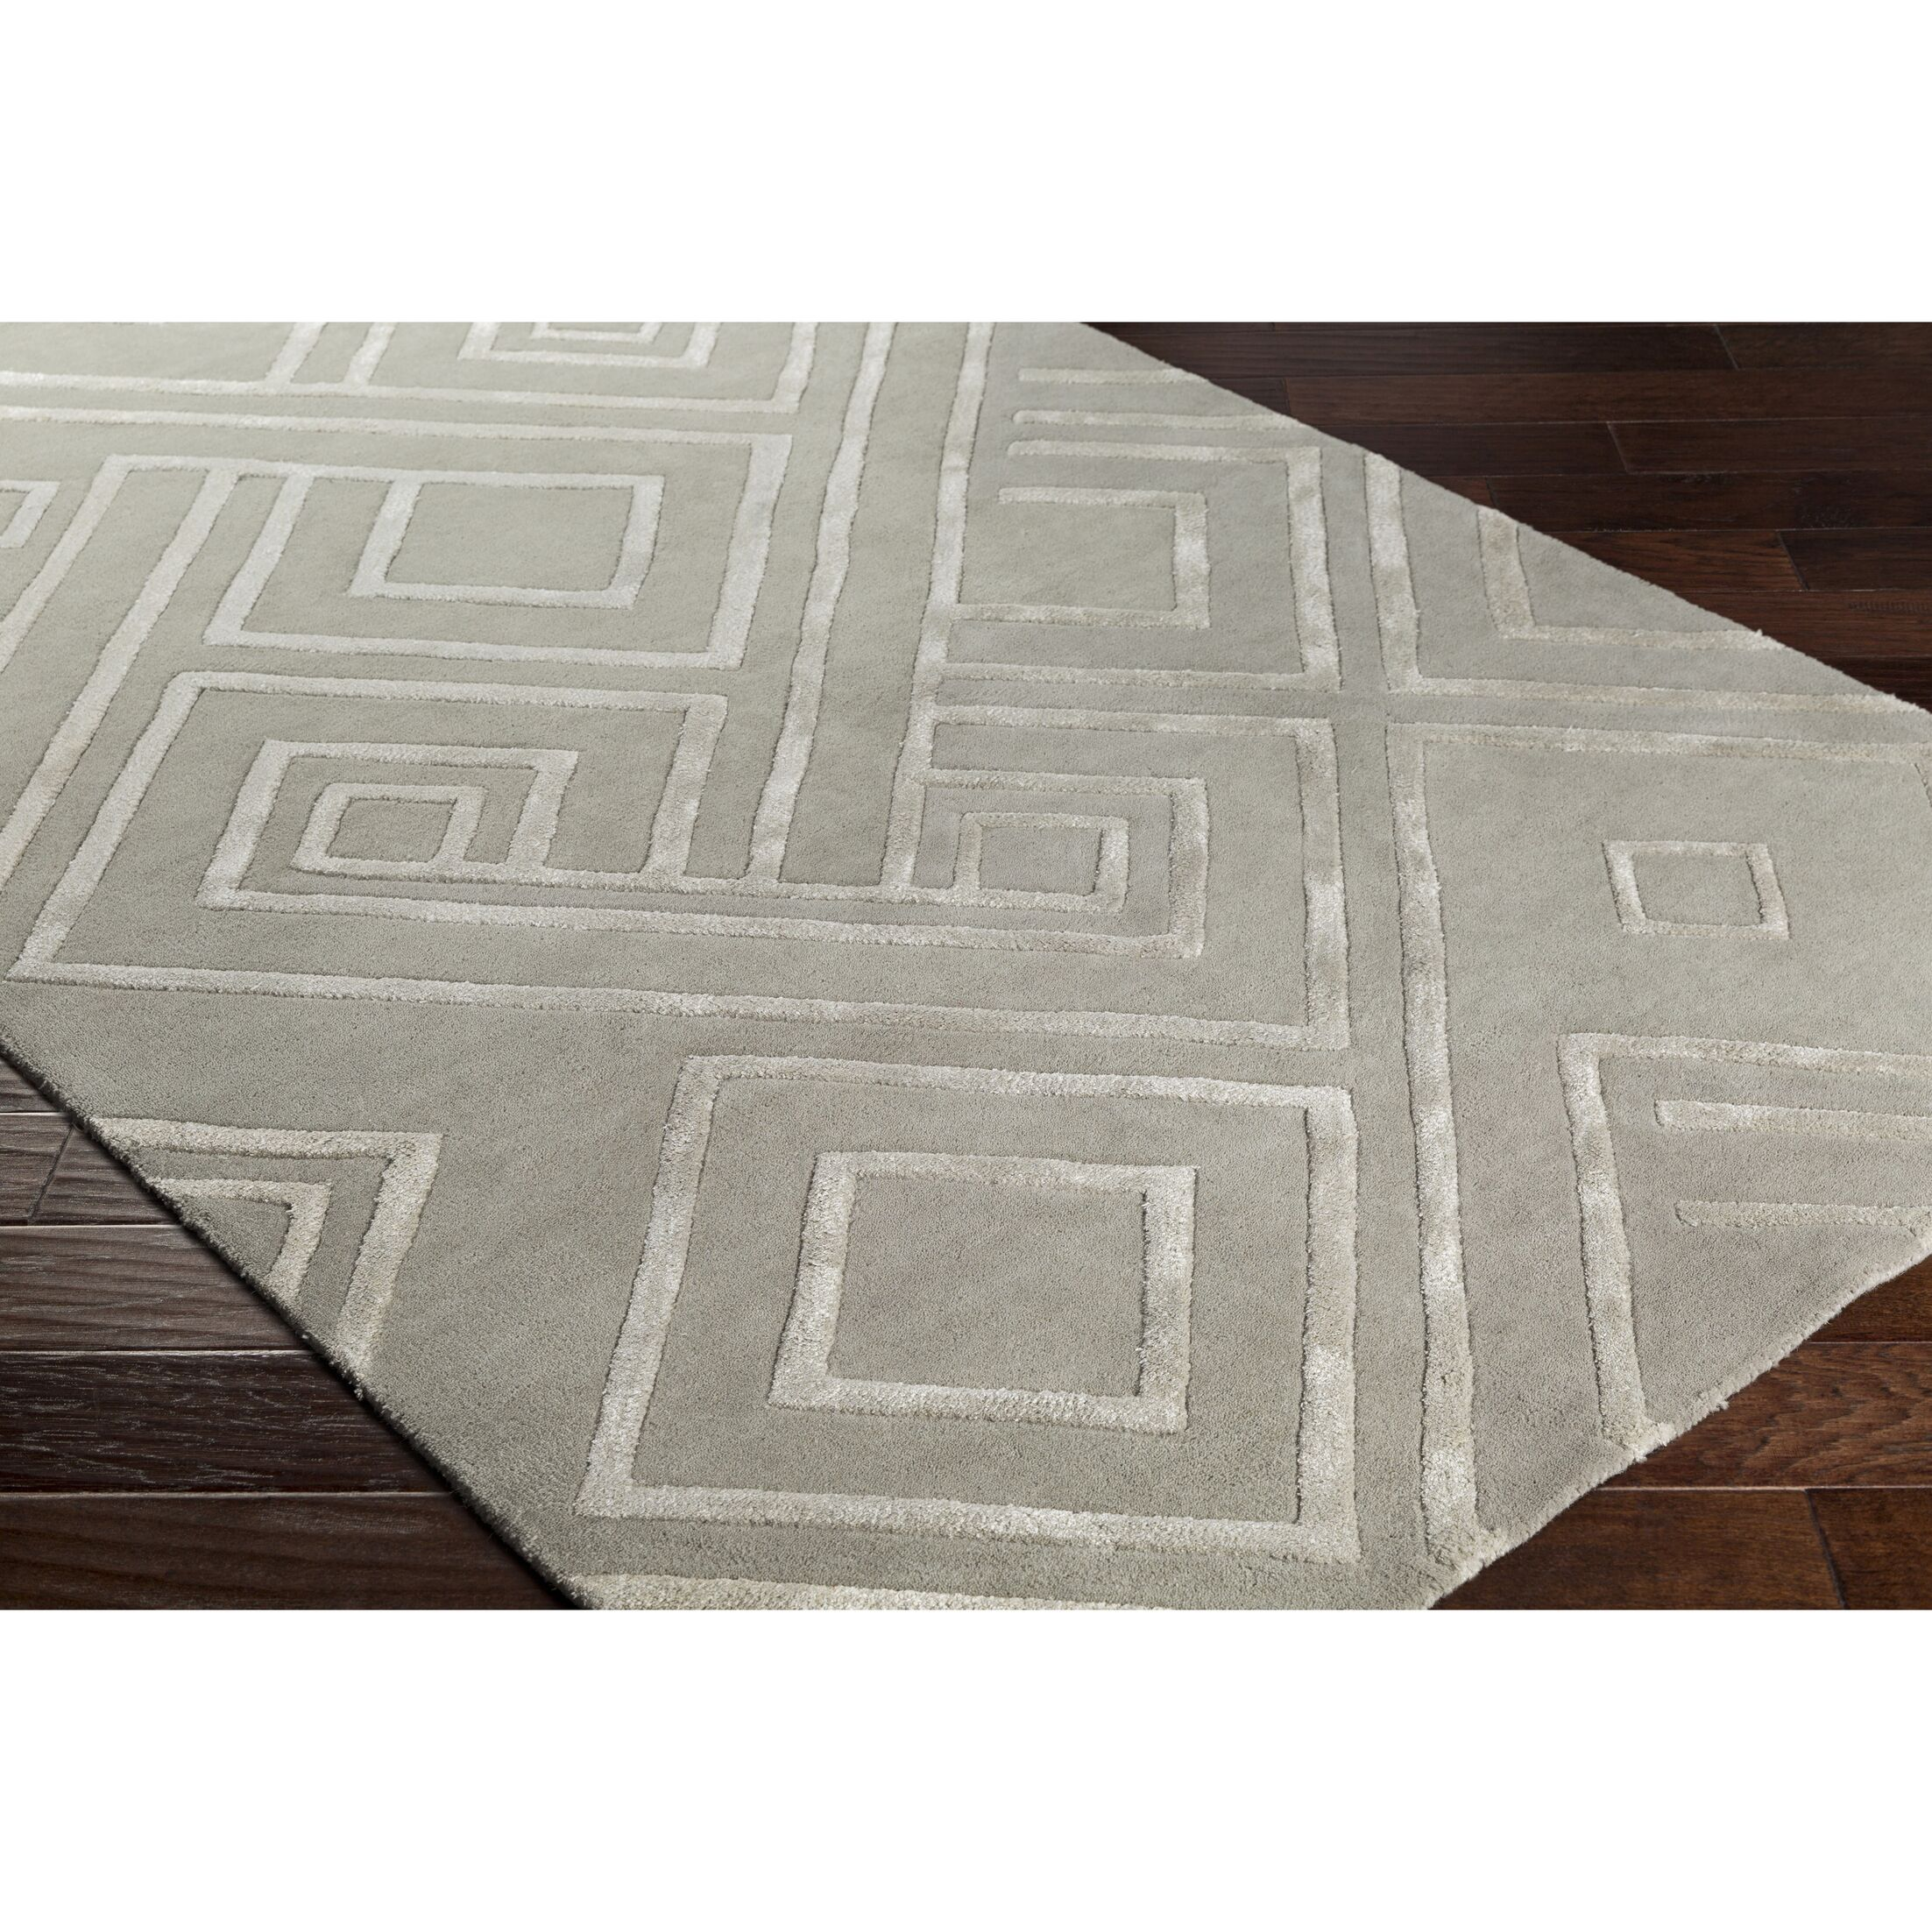 Vazquez Hand-Tufted Geometric Gray Area Rug Rug Size: Rectangle 5' x 7'6